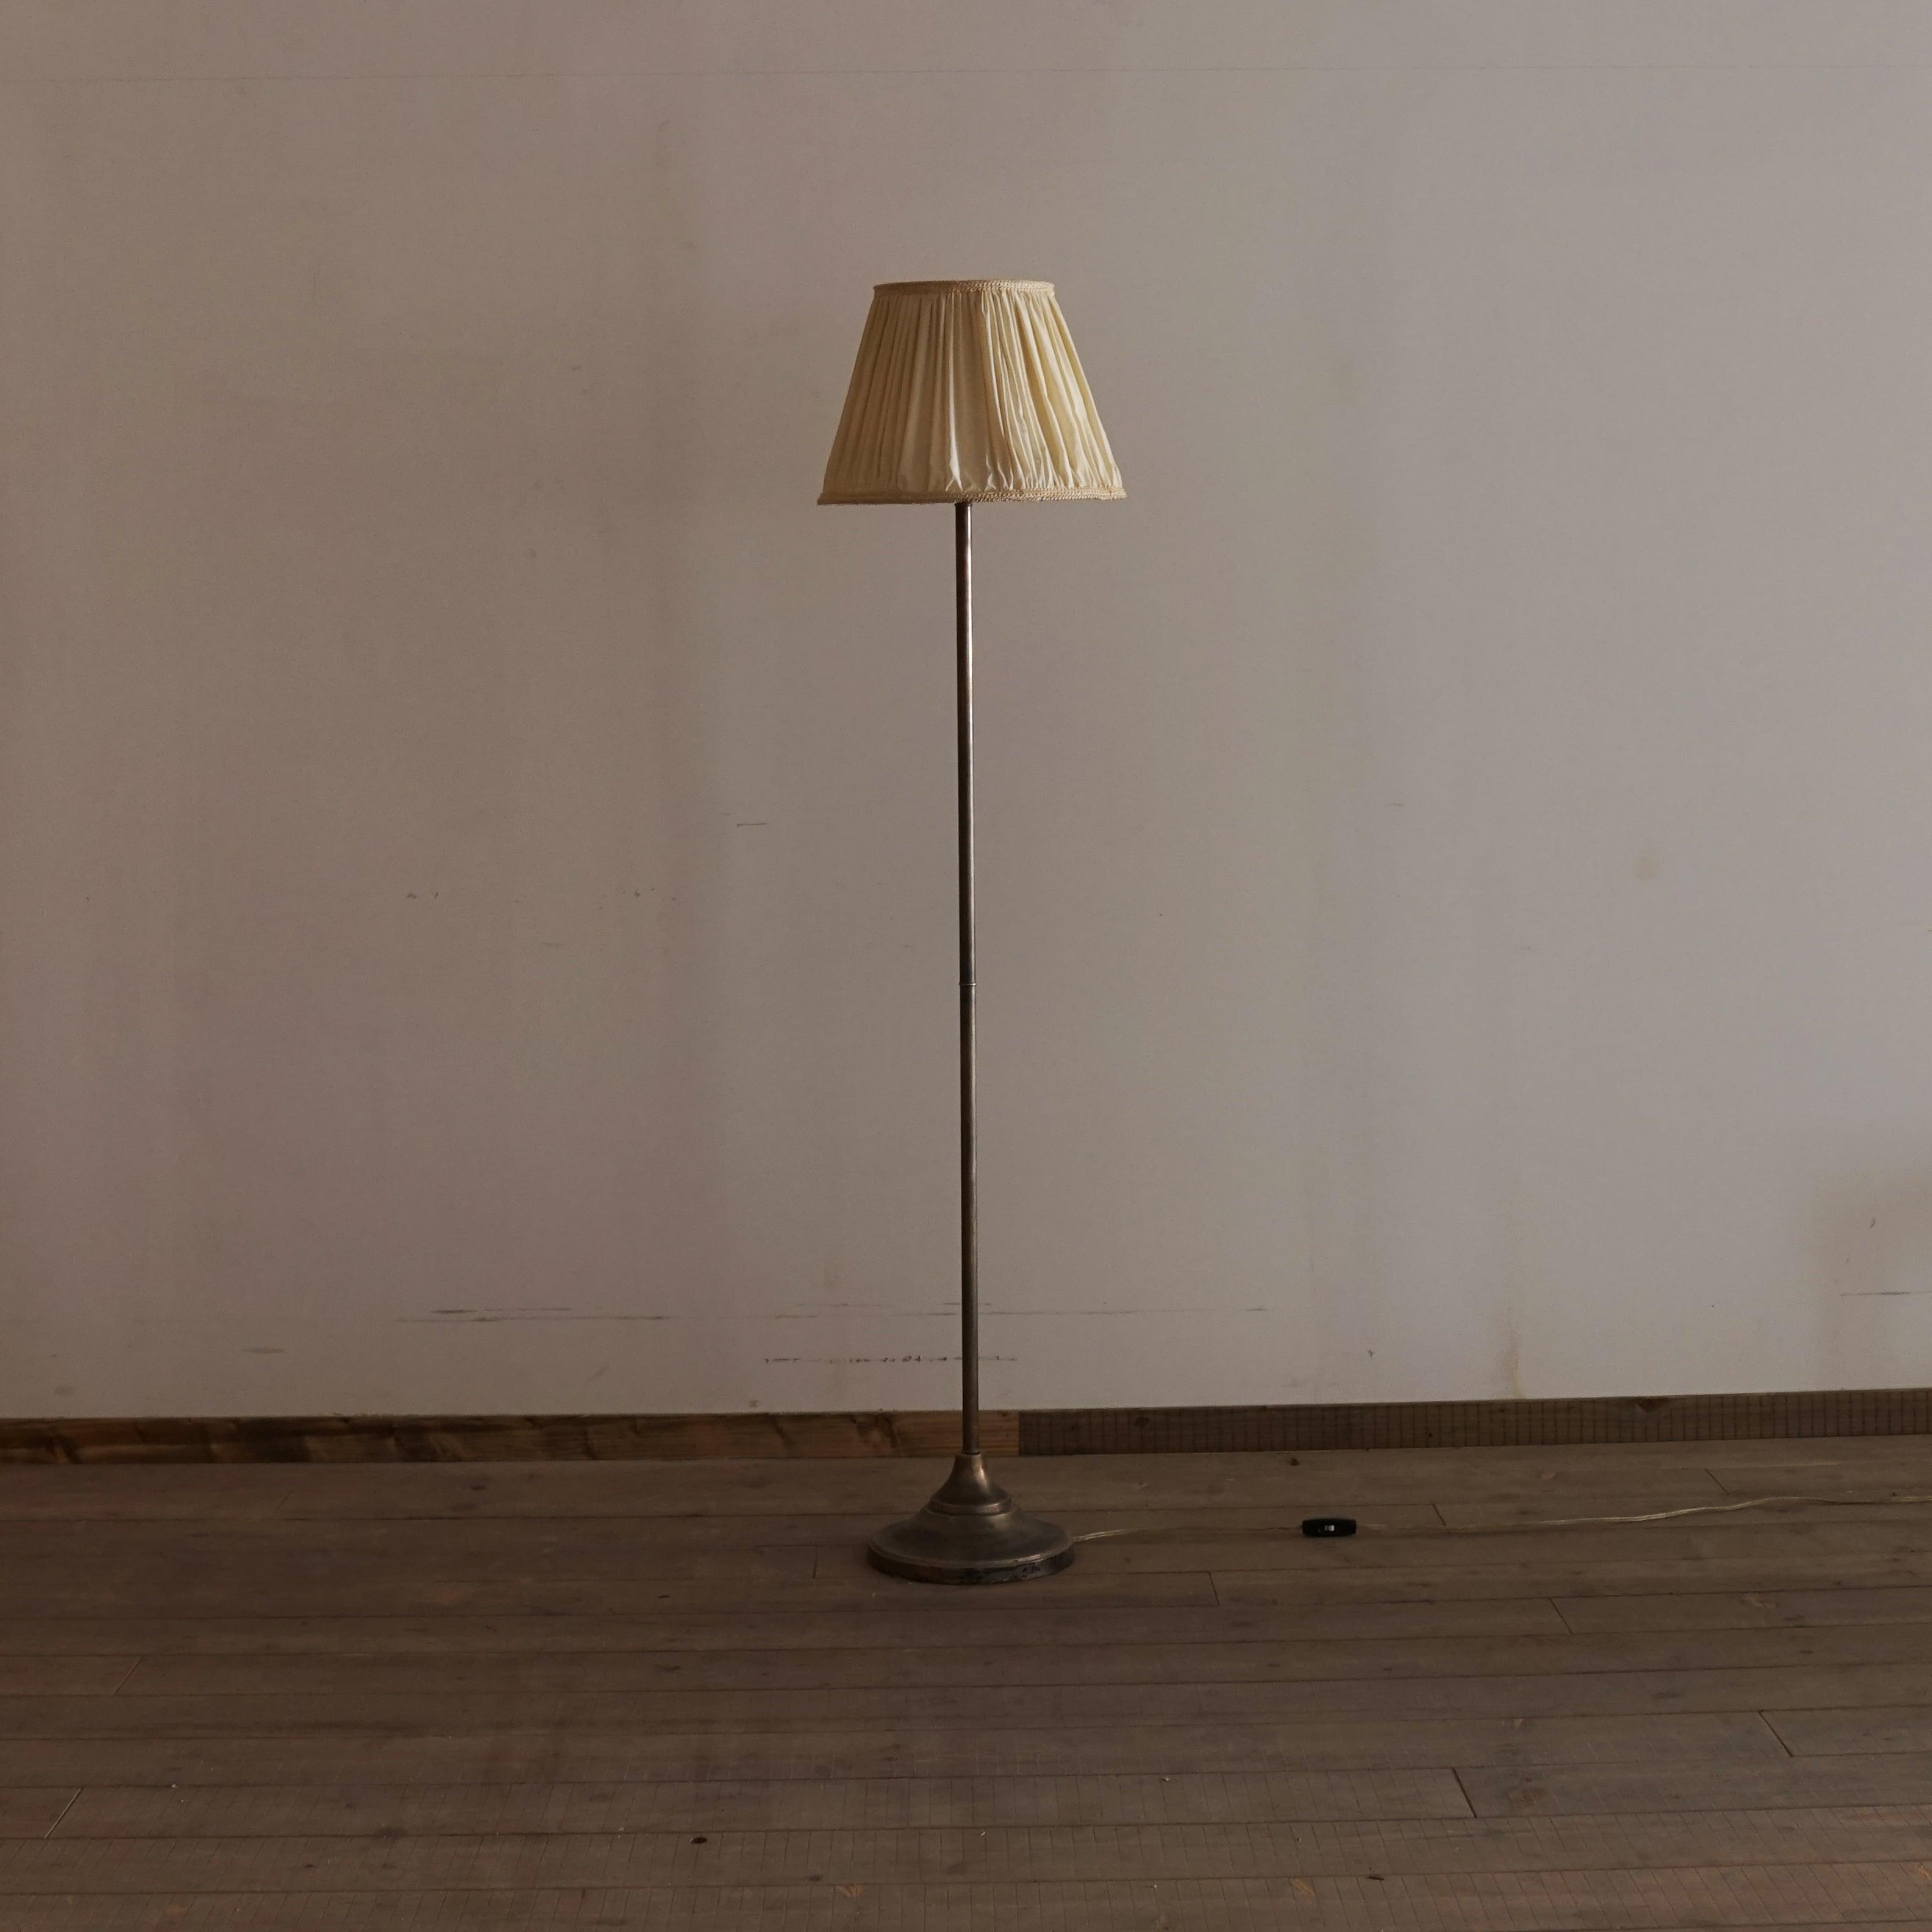 #01-13  Antique stand light